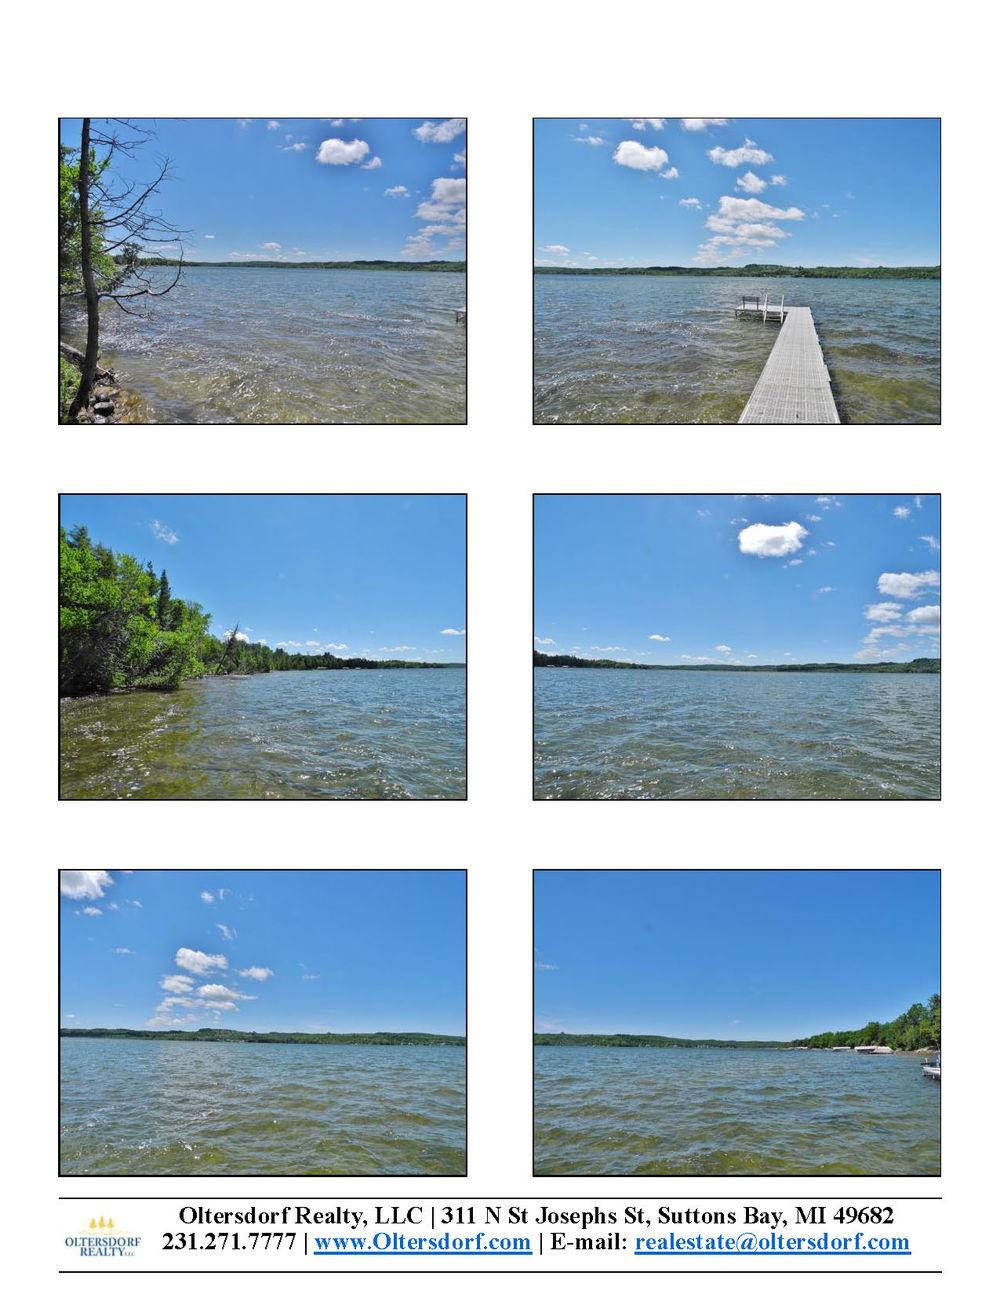 2736 S Lake Leelanau Dr, South Lake Leelanau Waterfront for sale by Oltersdorf Realty LLC - Marketing Packet (2).jpg